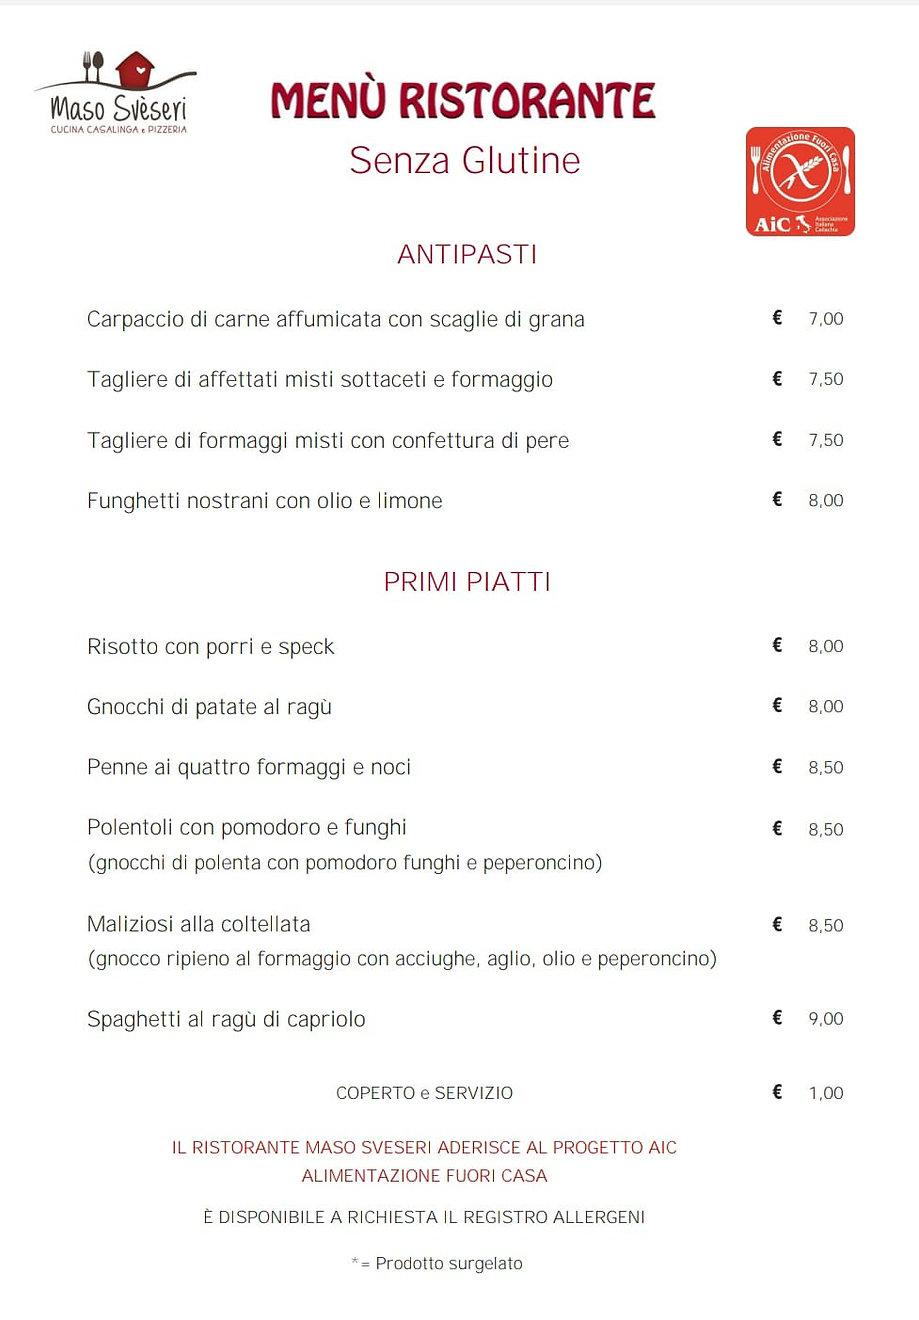 nuovo menu ristorante denza glutine 1.jpeg